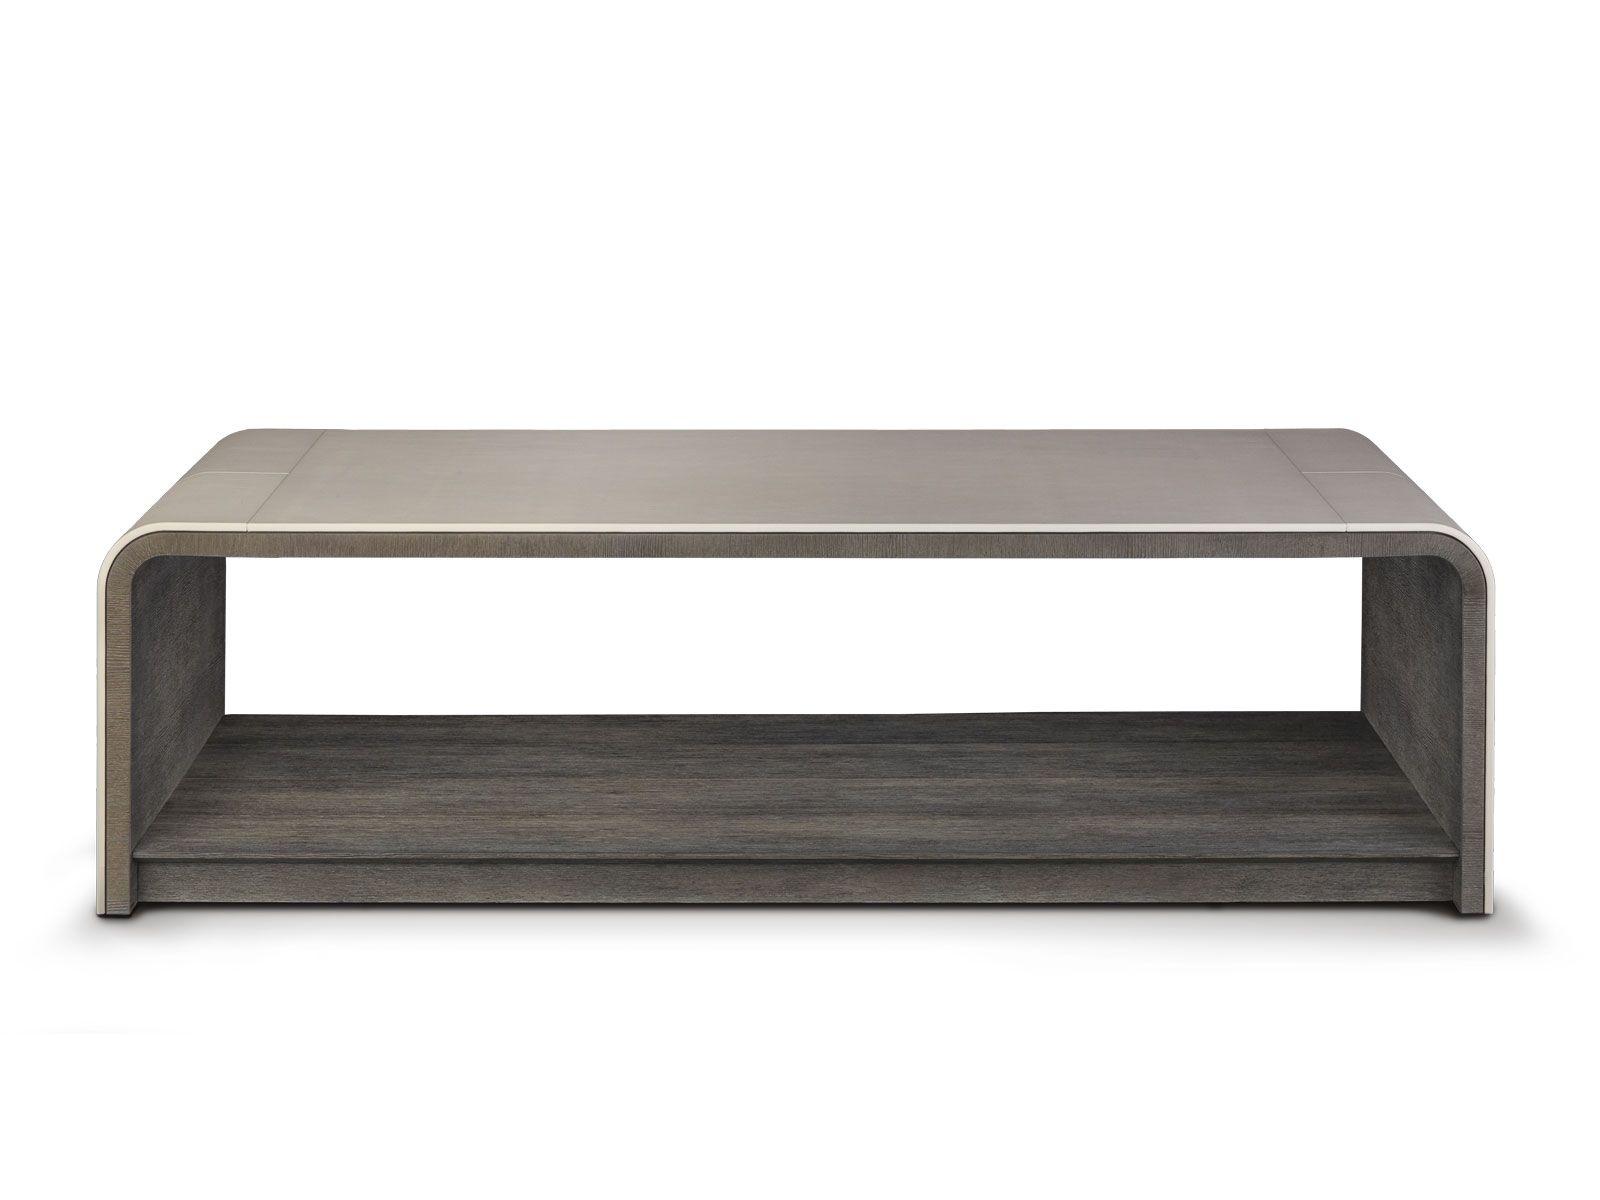 San Francisco Contemporary Interior Design Resource Table Furniture Coffee Table [ 1200 x 1600 Pixel ]